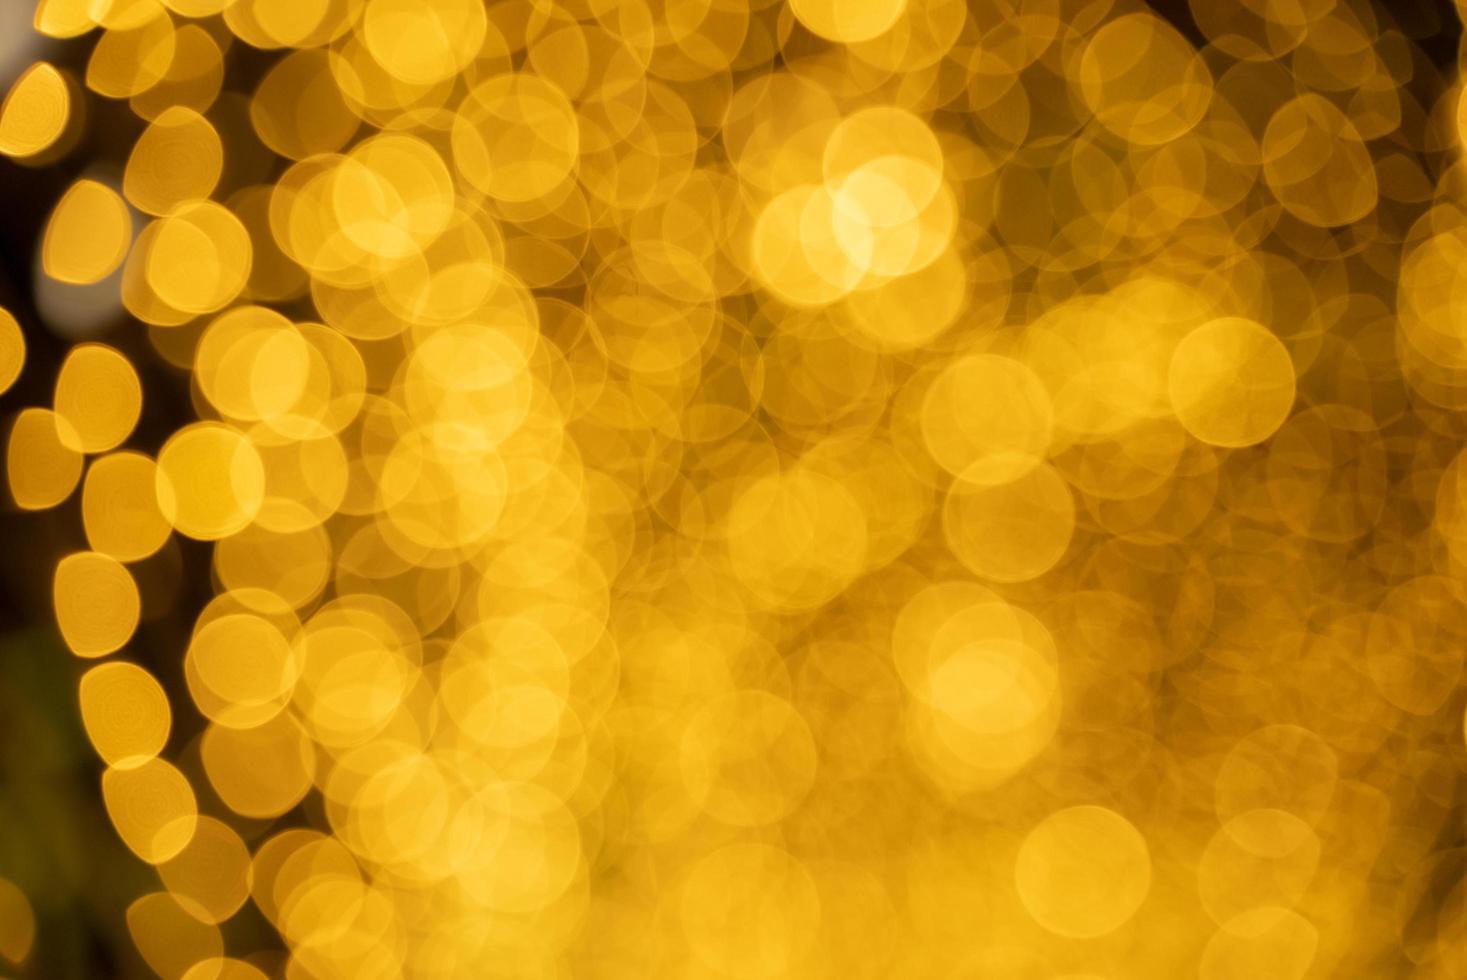 wazig gouden lichten foto